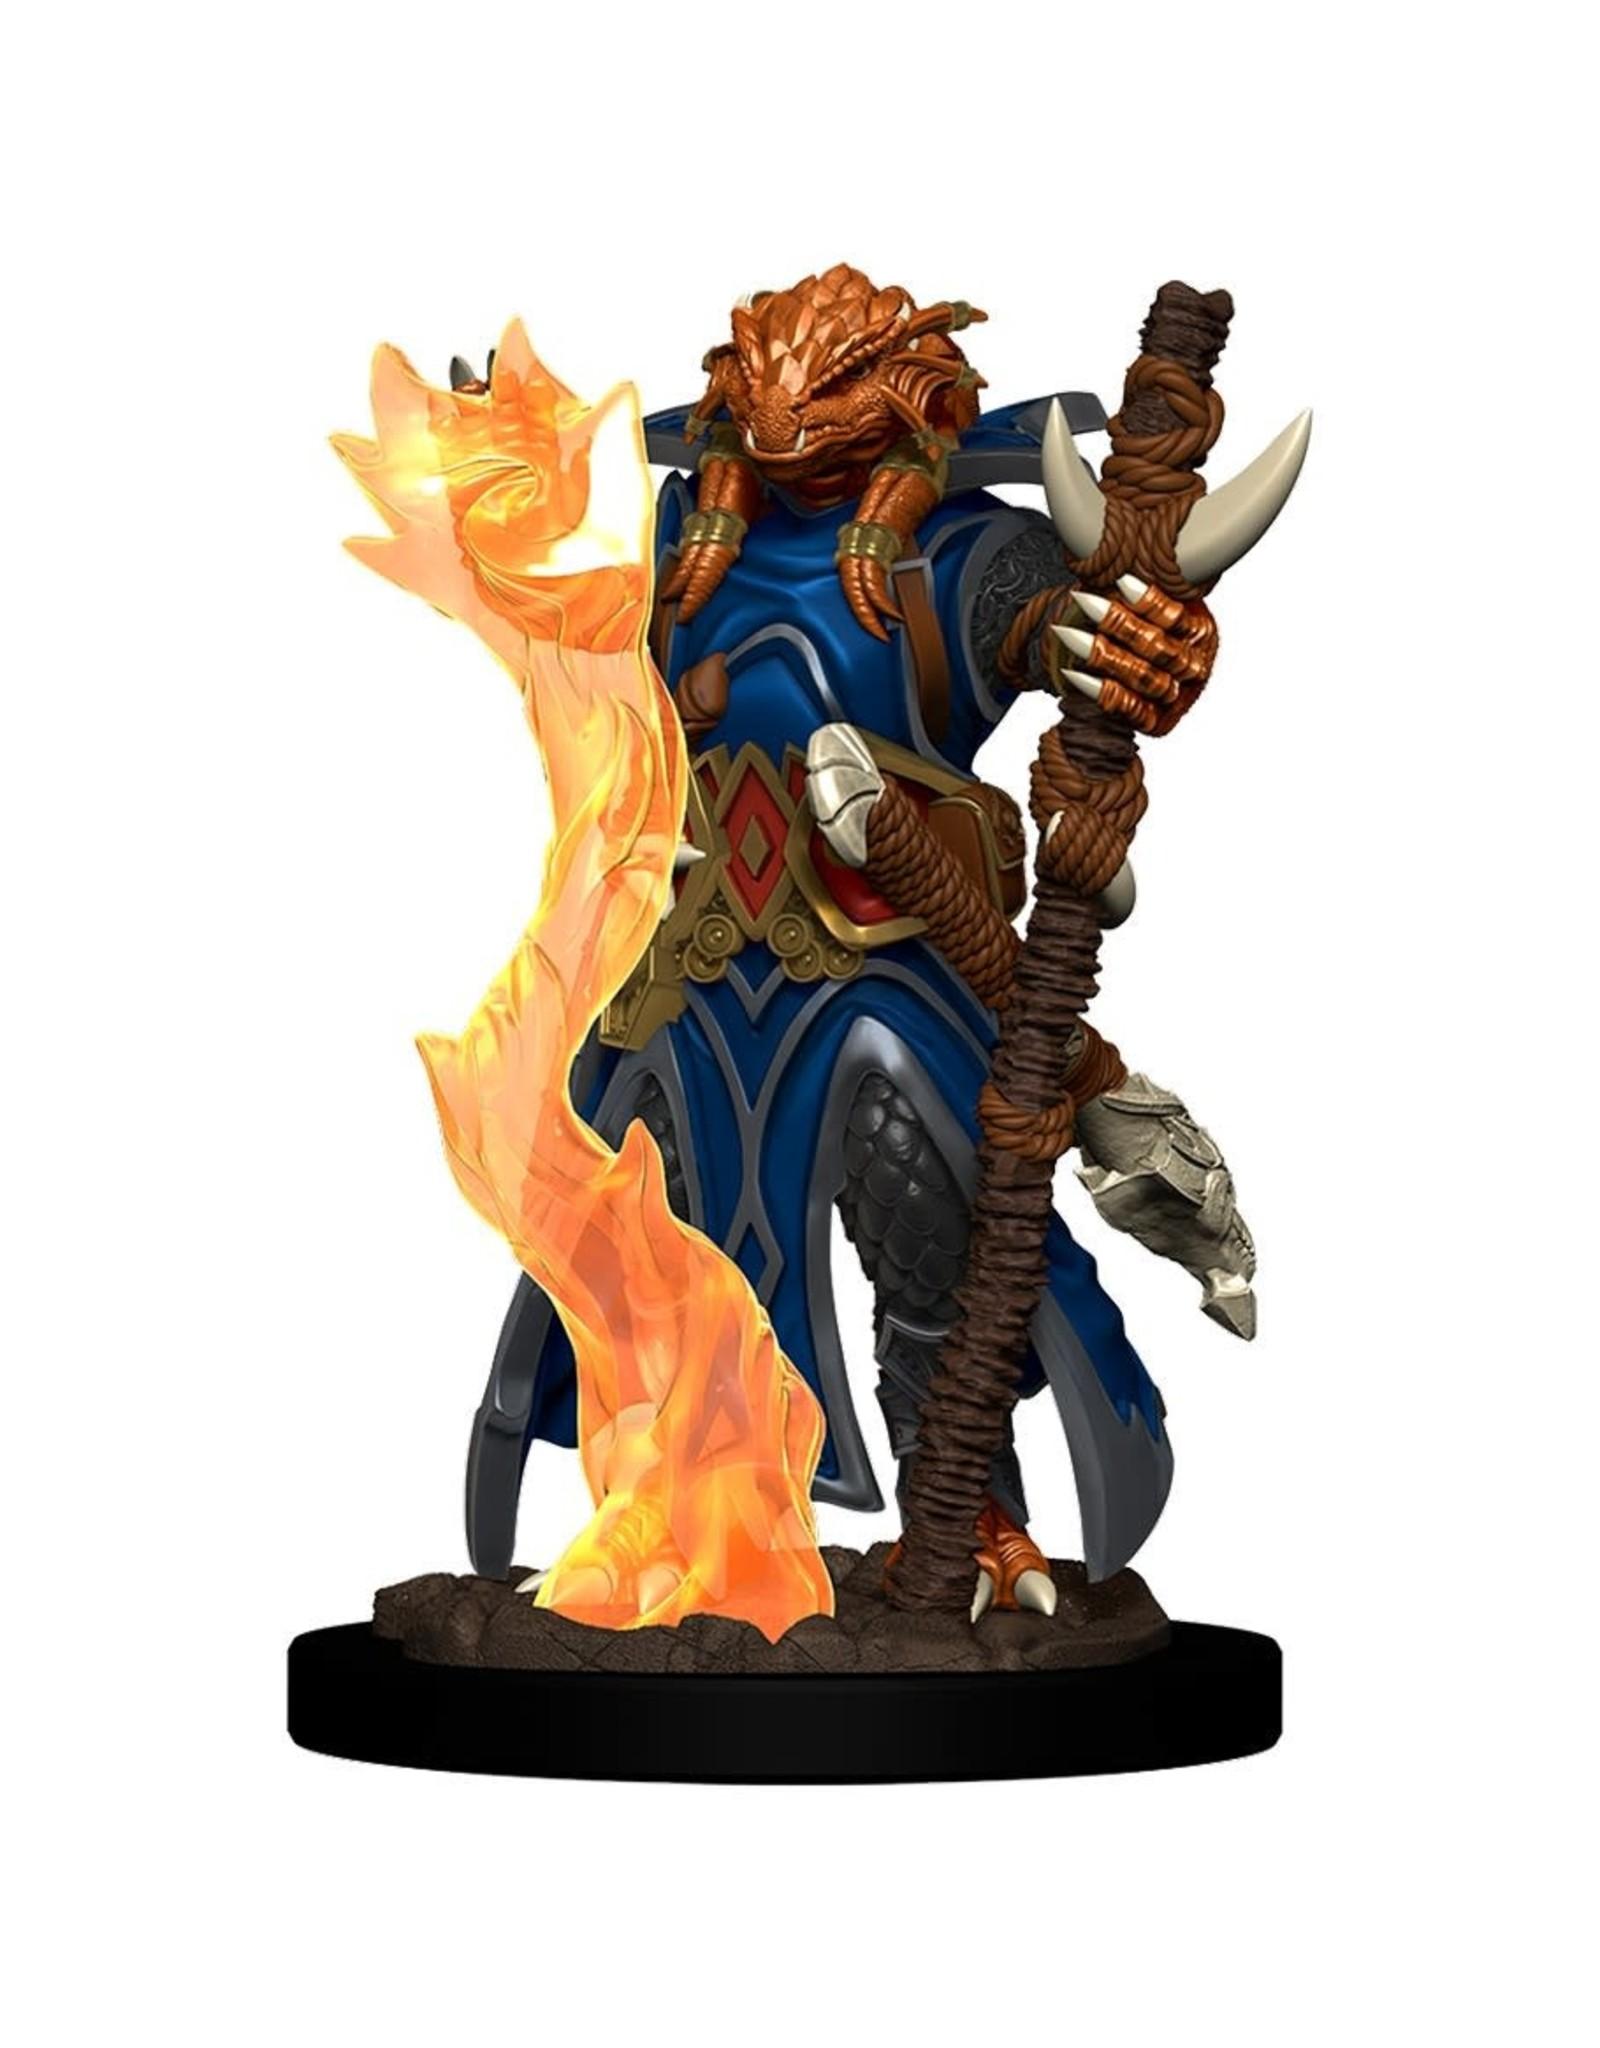 Wizkids Premium Figures - Dragonborn Sorcerer Female W4 Icons of the Realms - D&D Minis